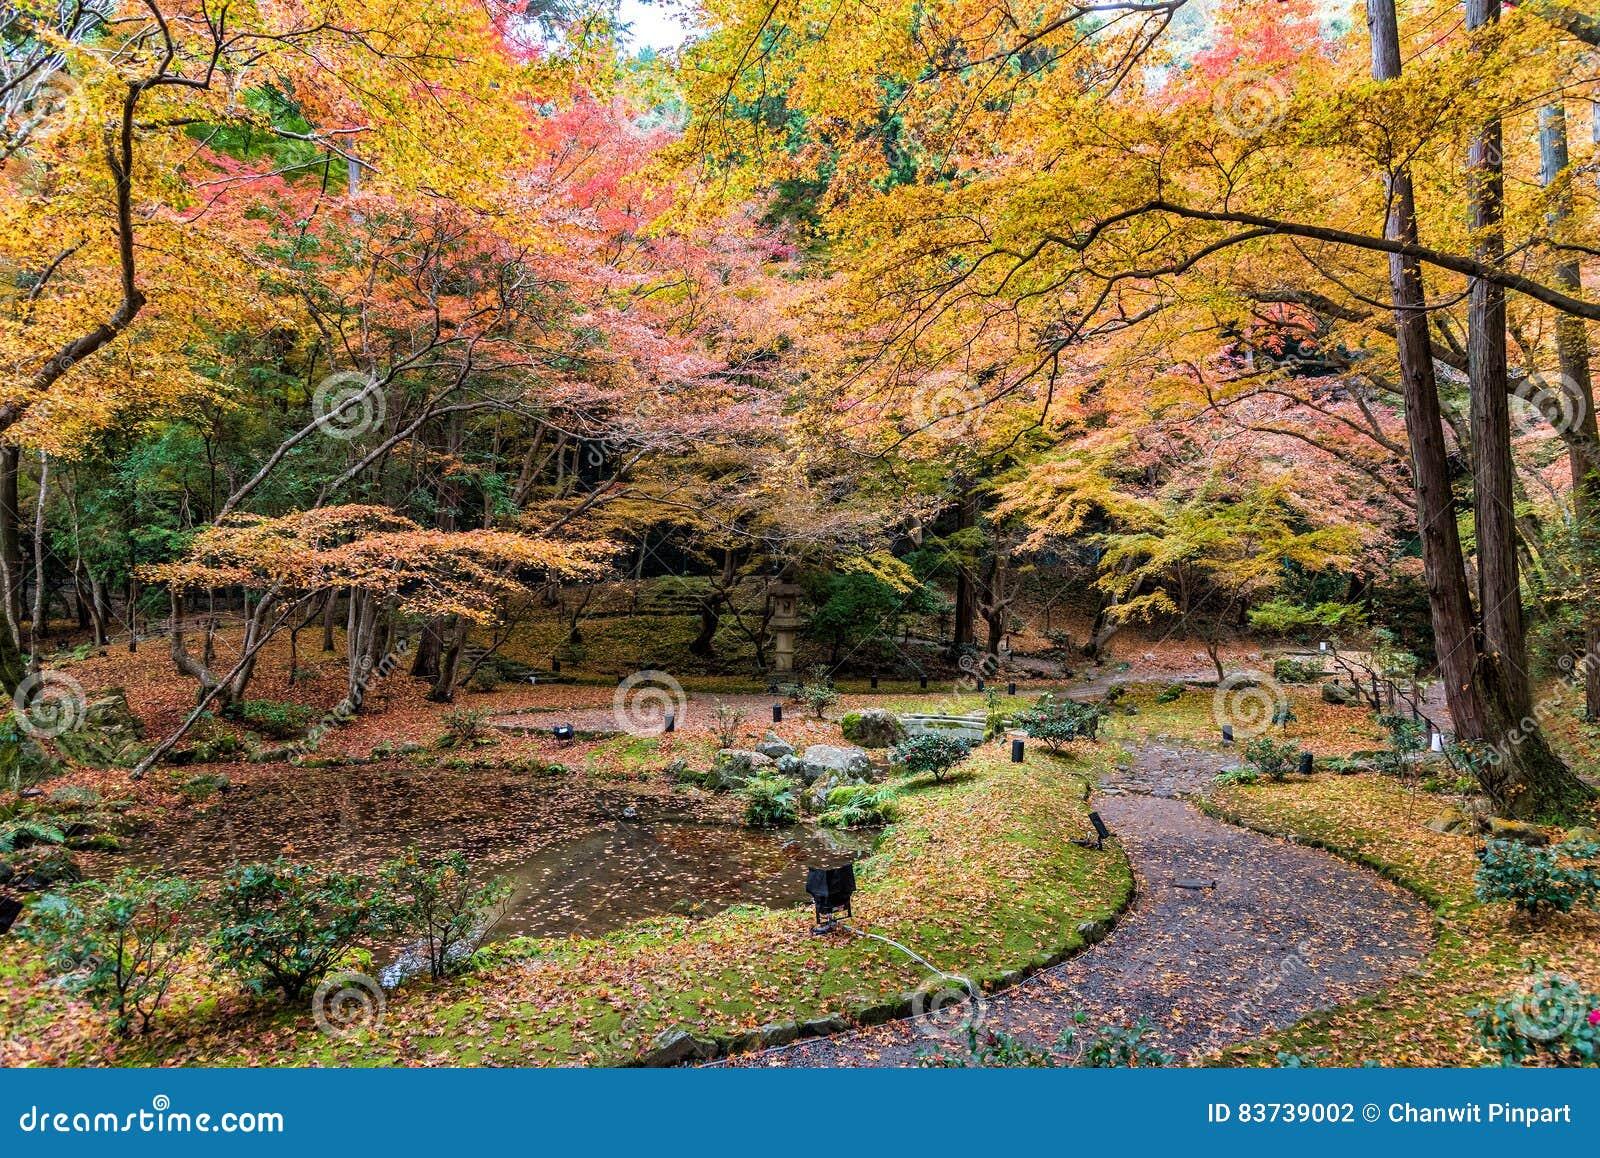 Autumn Garden And Forest In Daigoji Temple. Kyoto, Japan Stock Photo ...